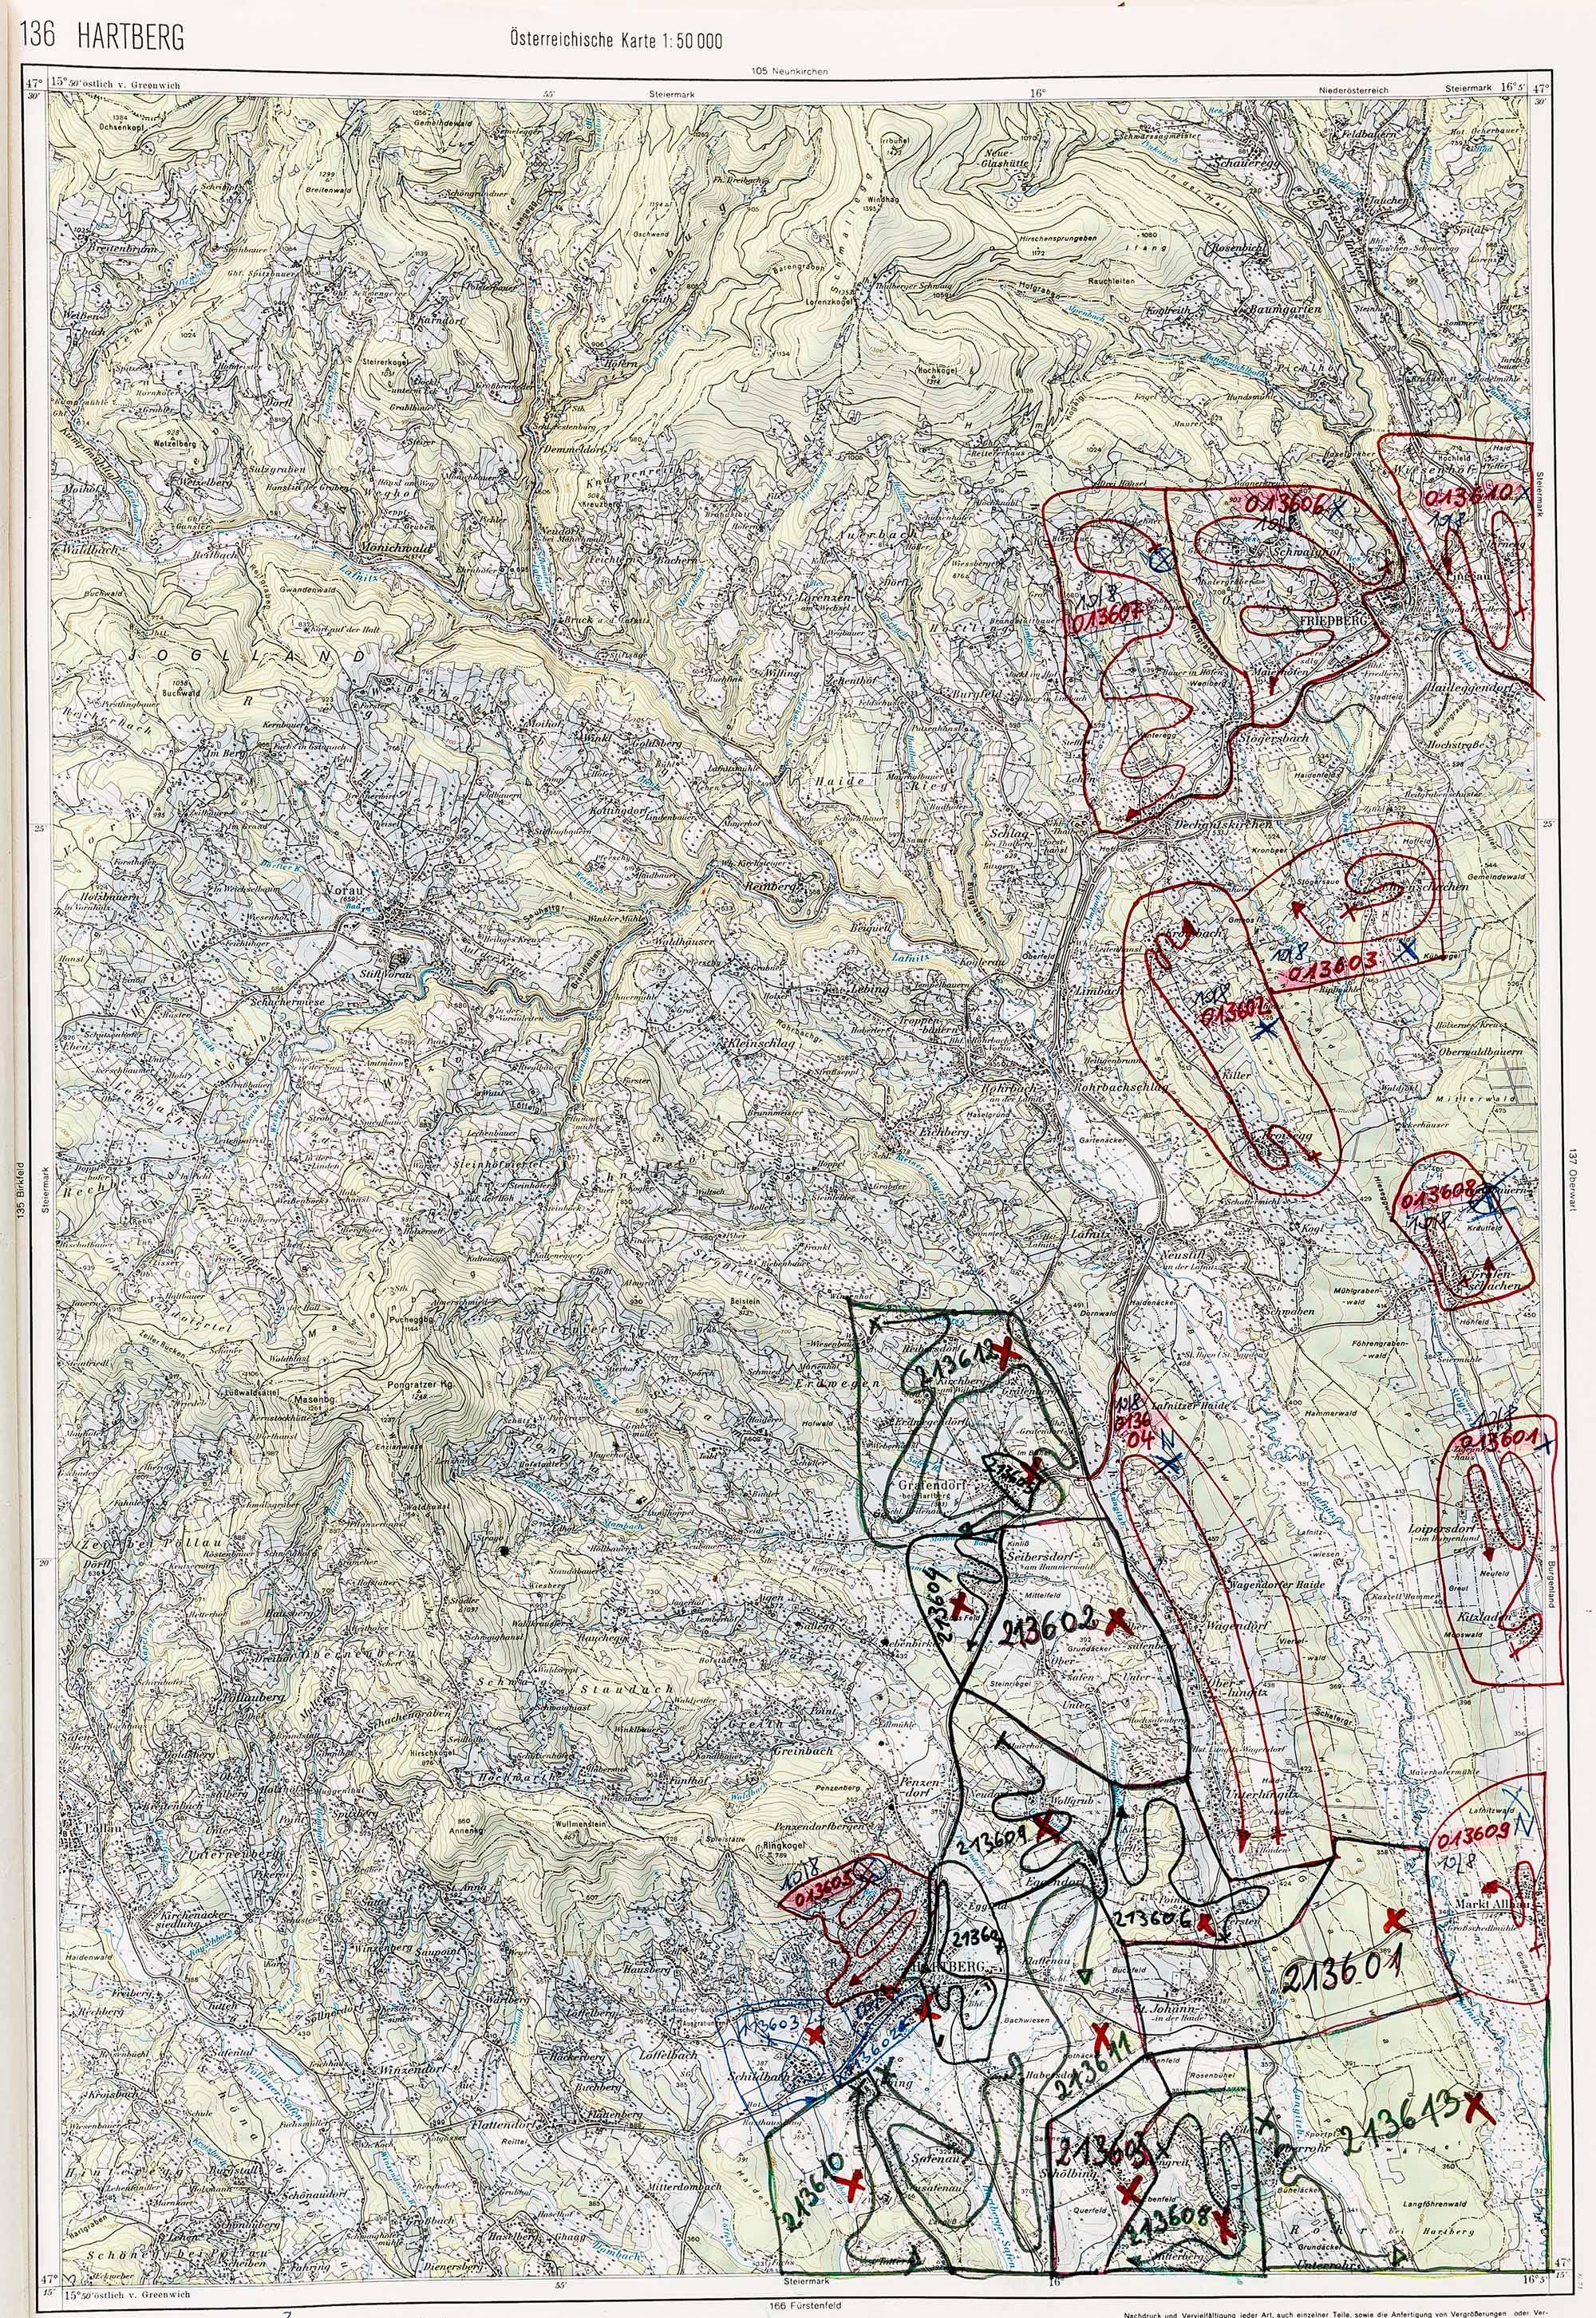 1979-1982 Karte 136